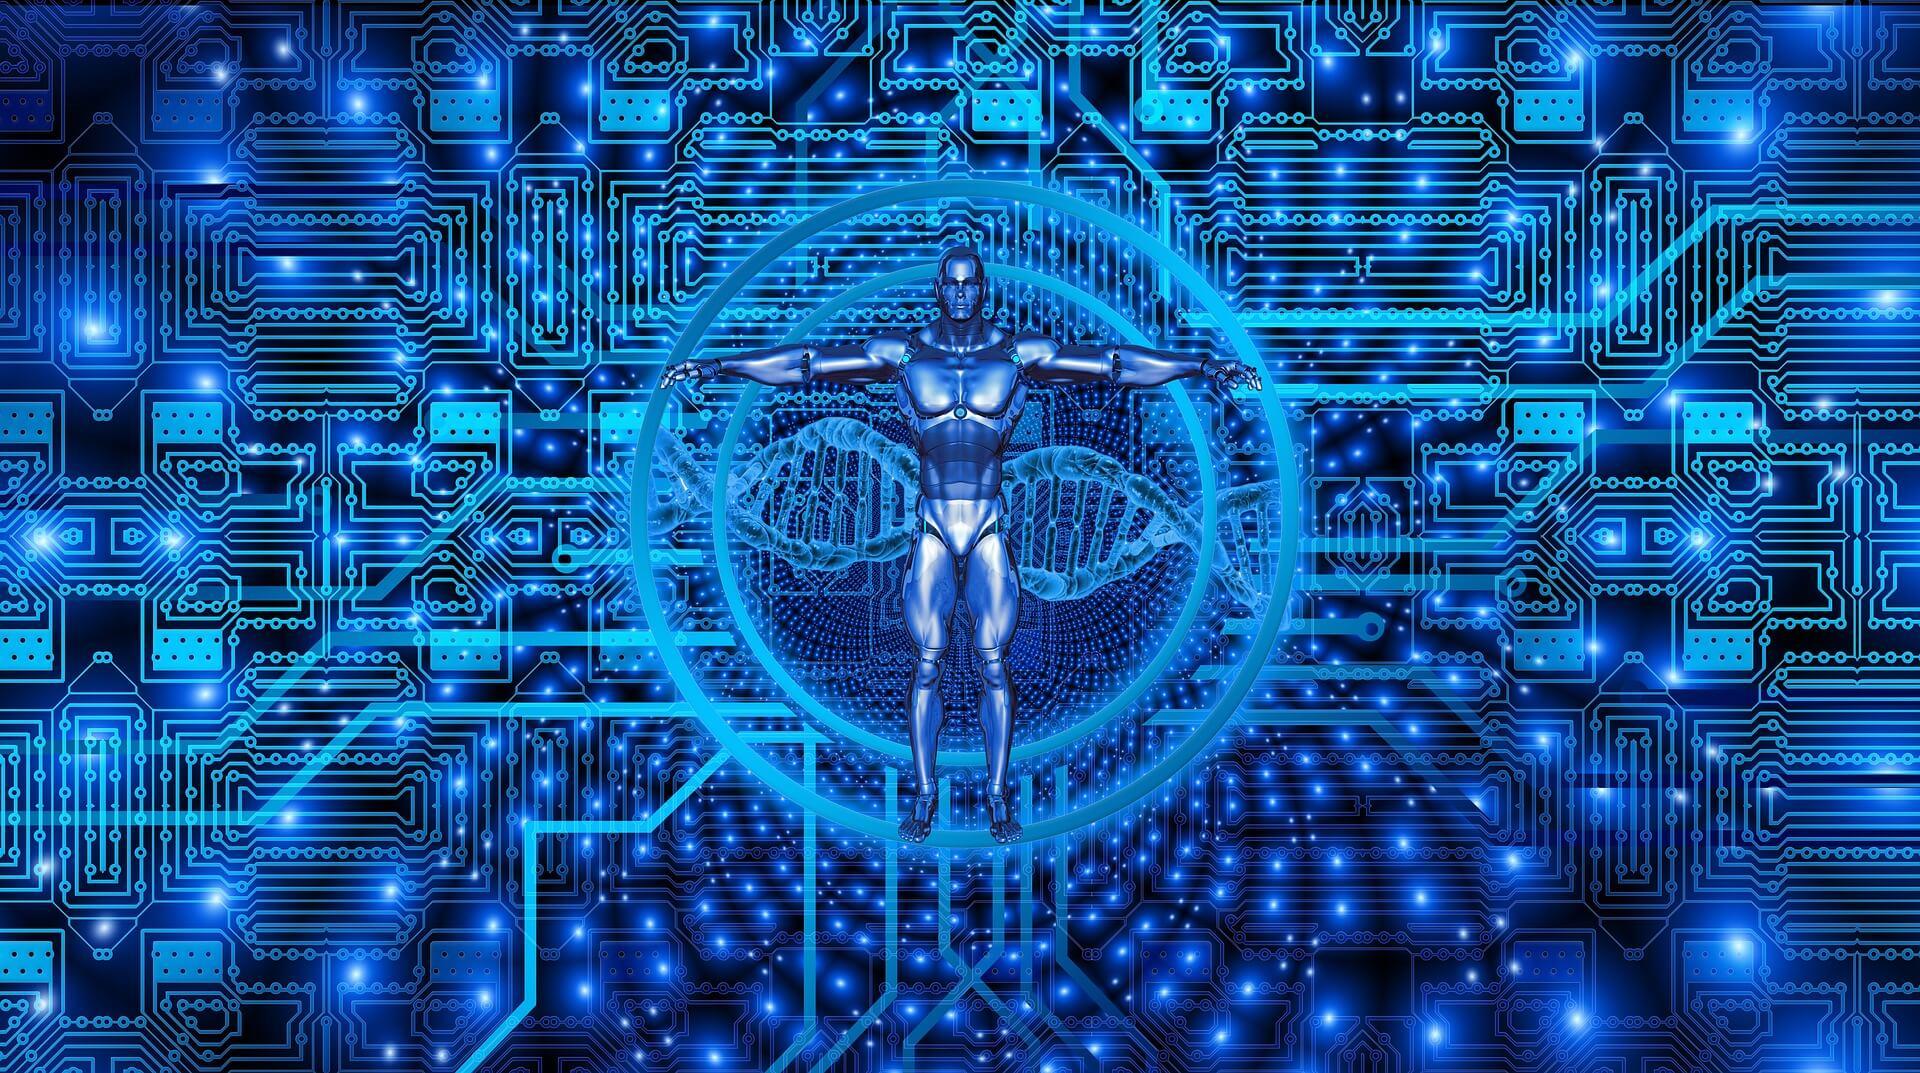 zanimljivosti o tehnologiji cyborg